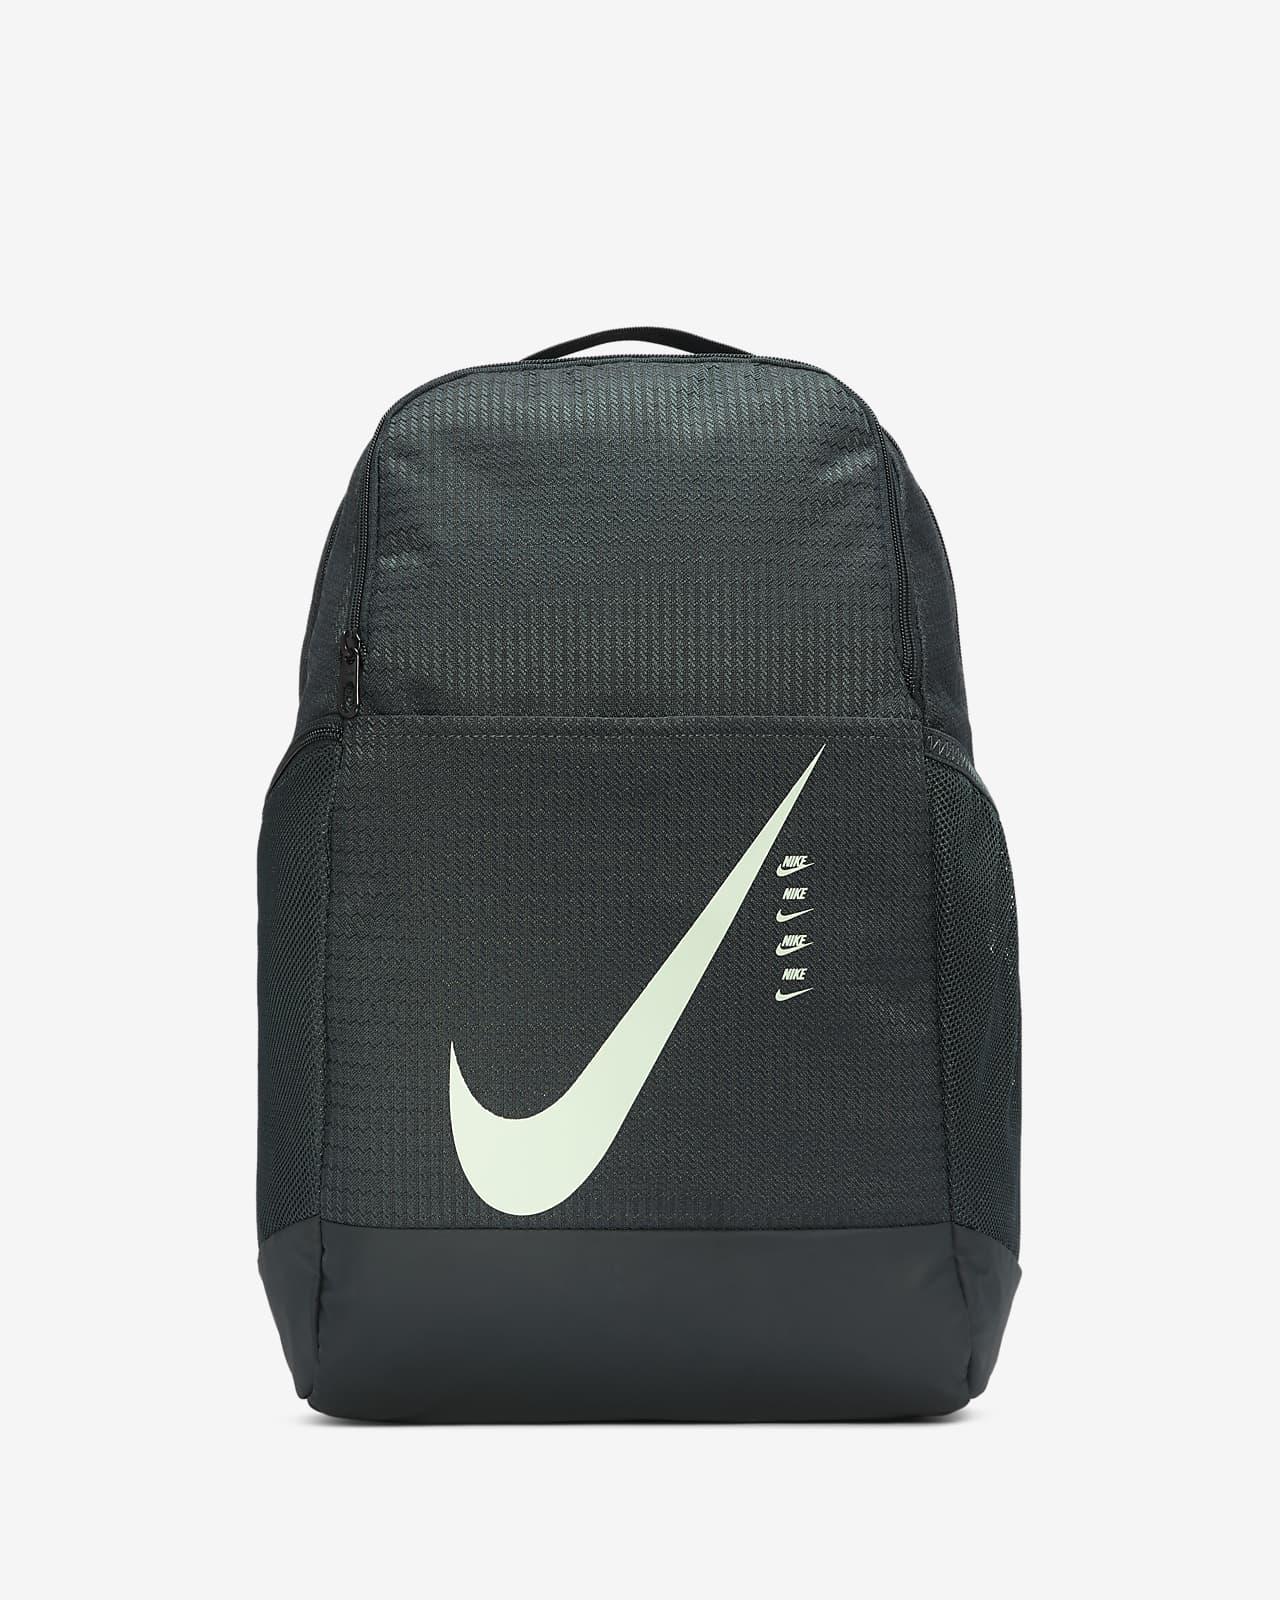 Nike Brasilia 9.0 Trainings-Rucksack (Medium)